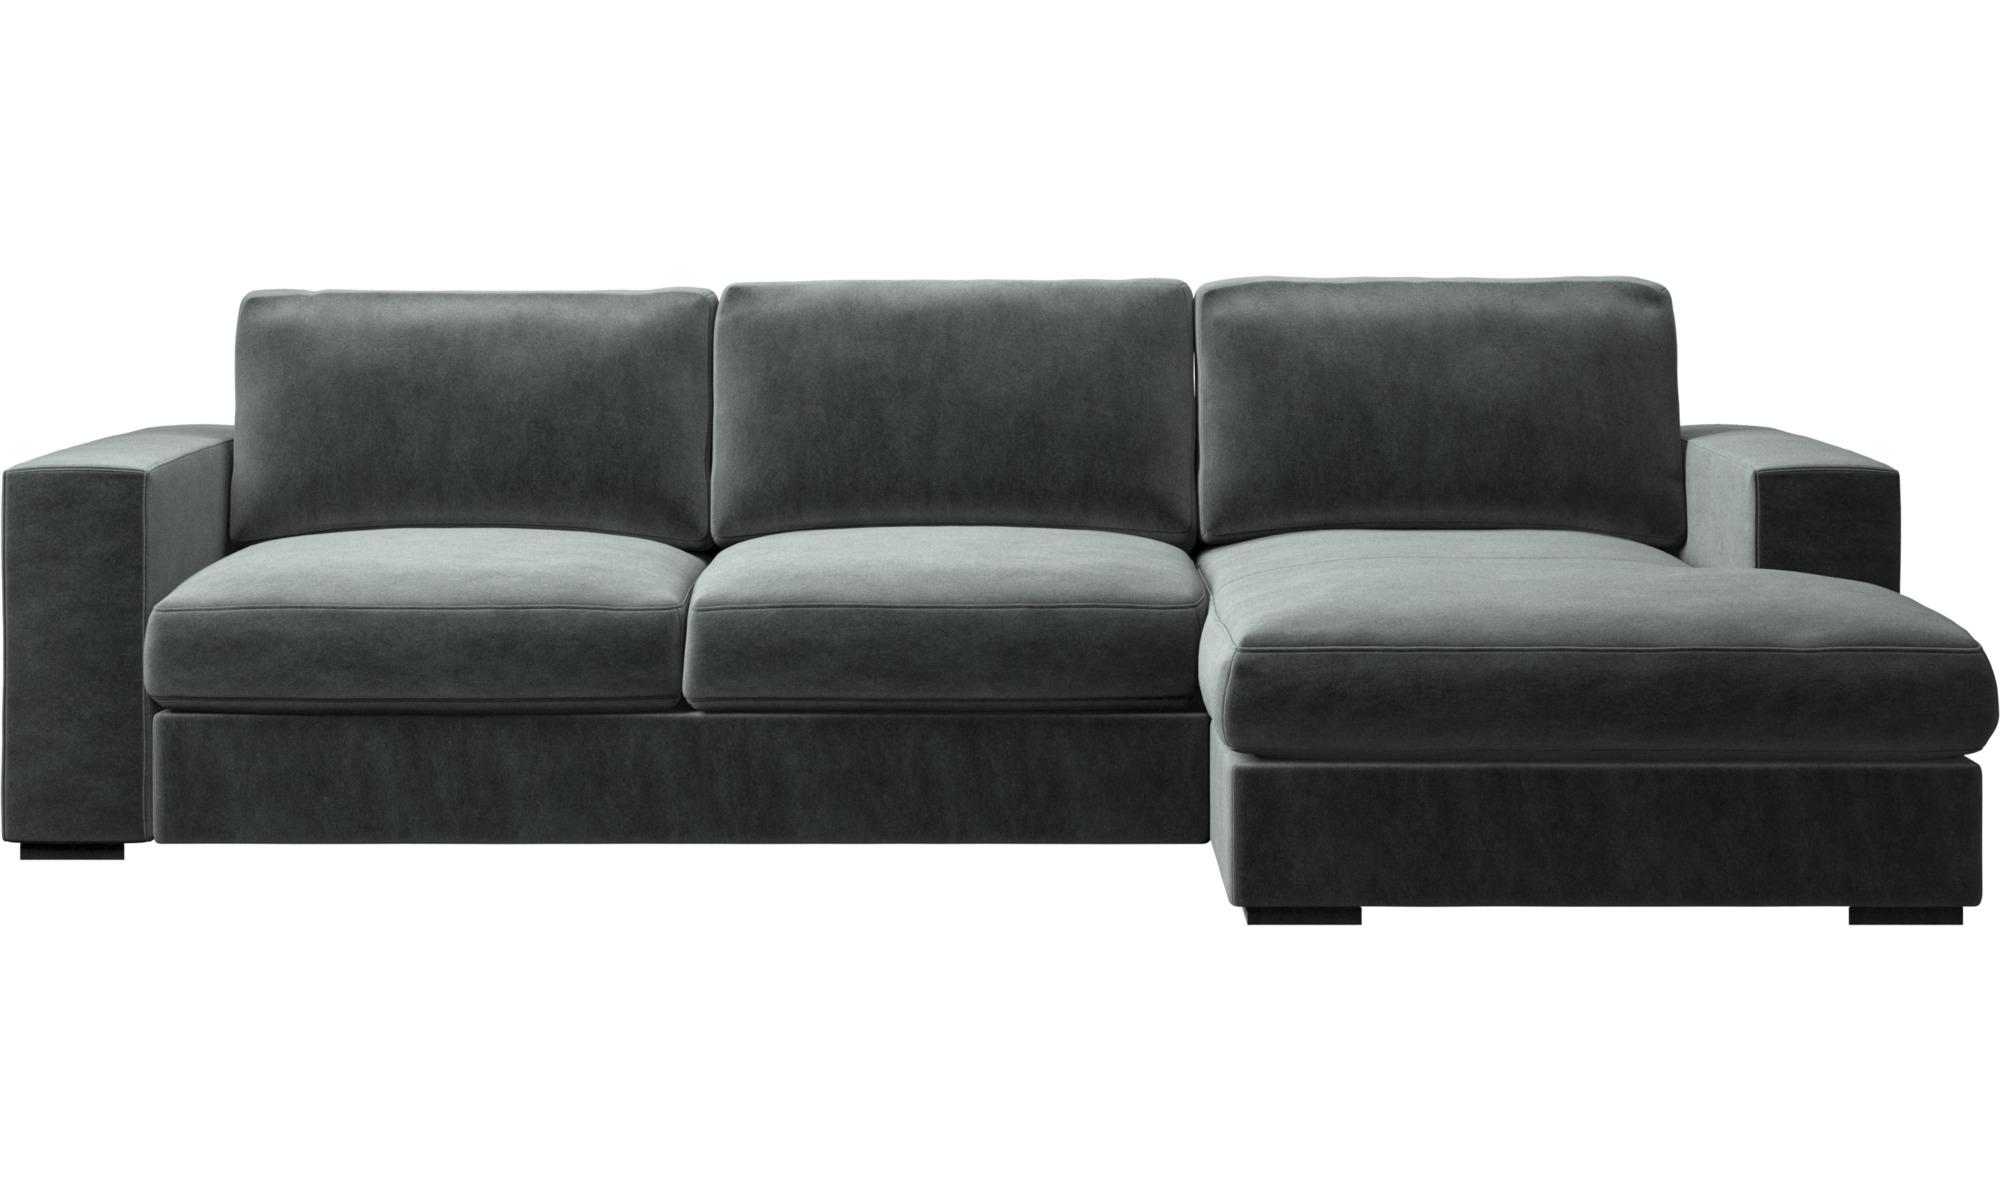 Chaise Longue Sofas Cenova Divano Con